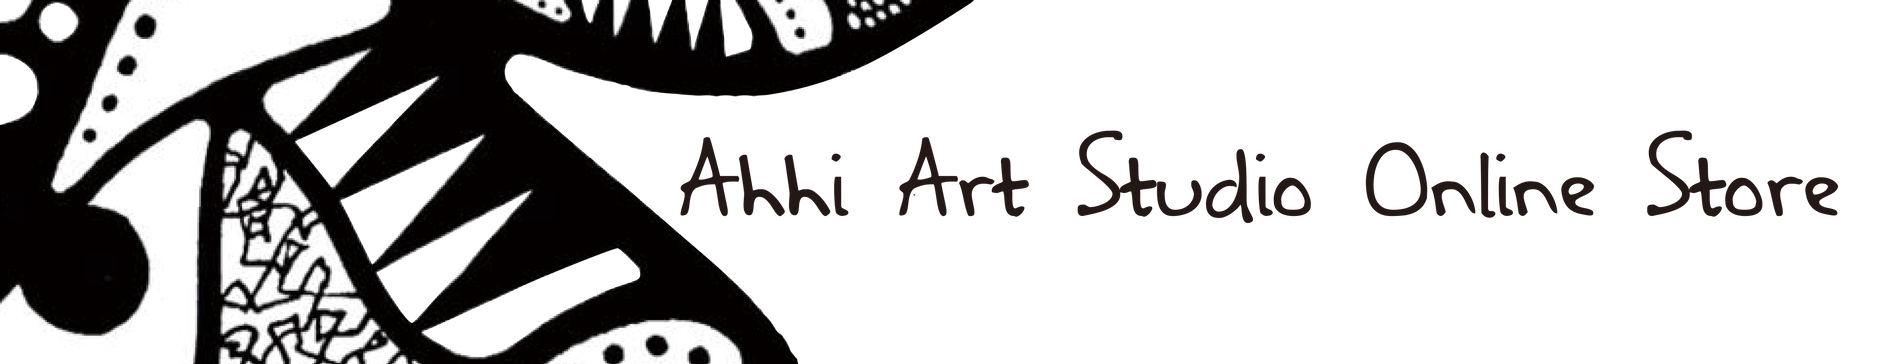 Ahhi Art Studio Online Store